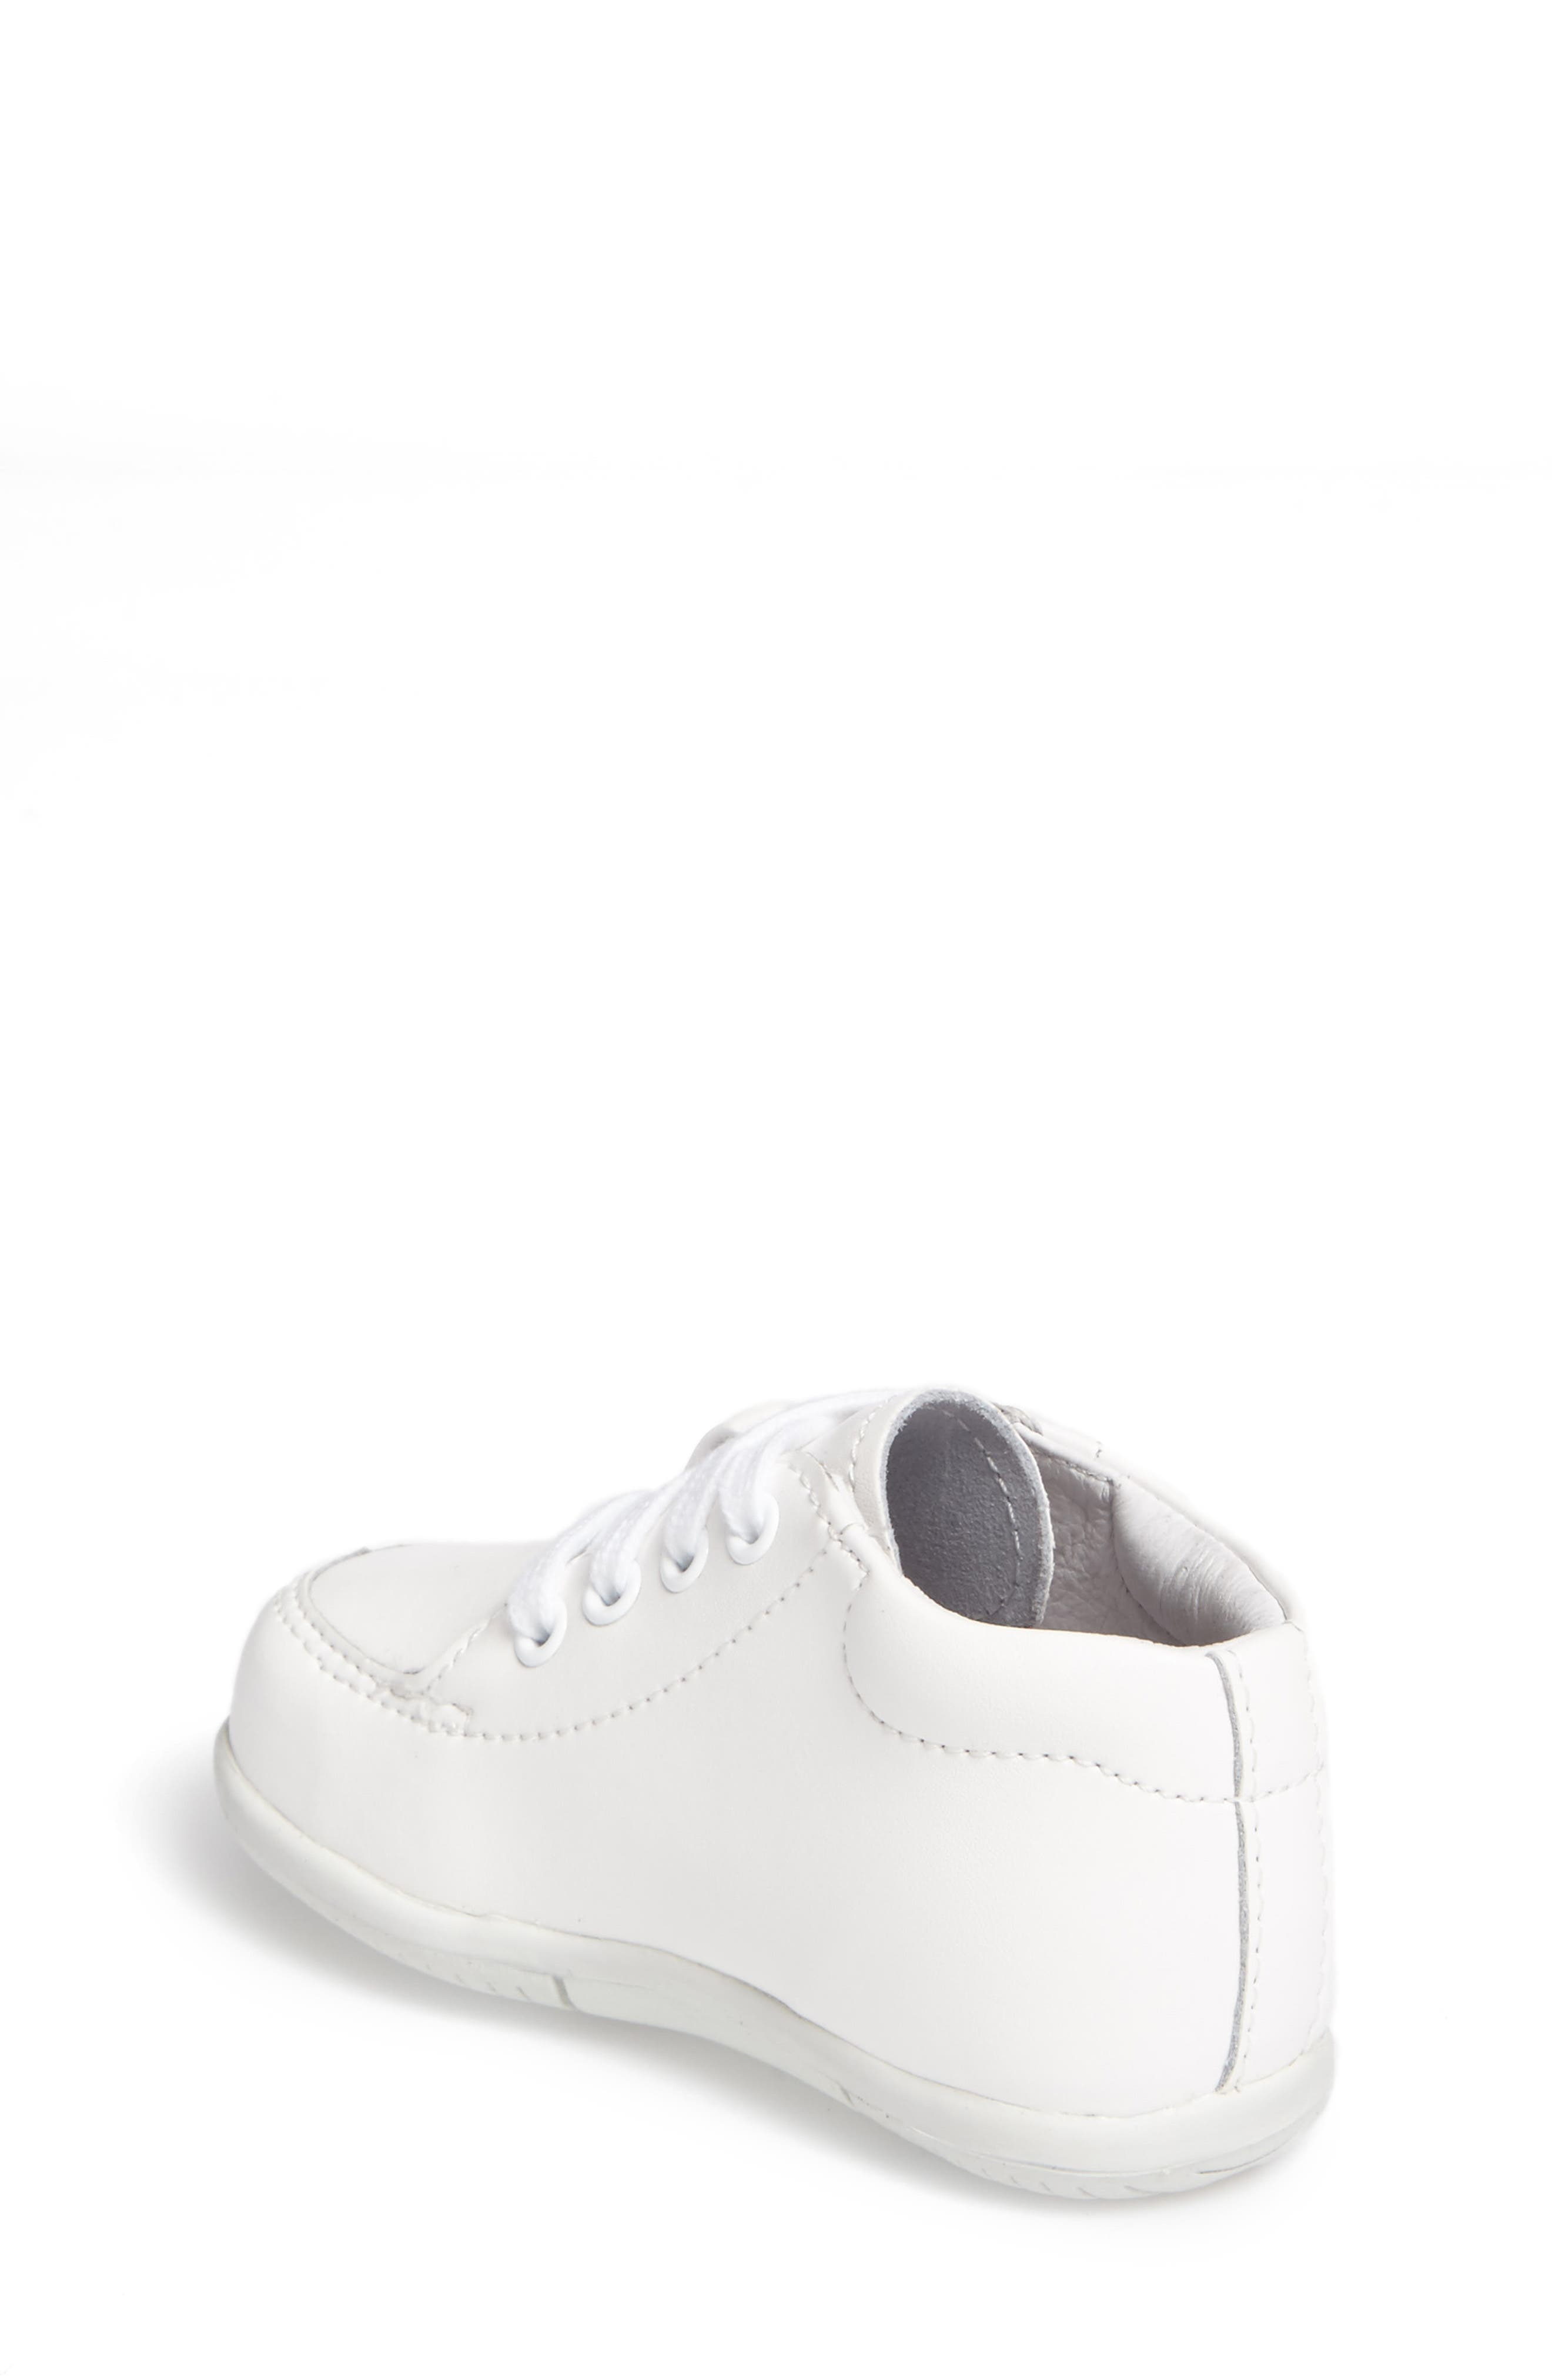 STRIDE RITE, Grayson Sneaker, Alternate thumbnail 2, color, WHITE